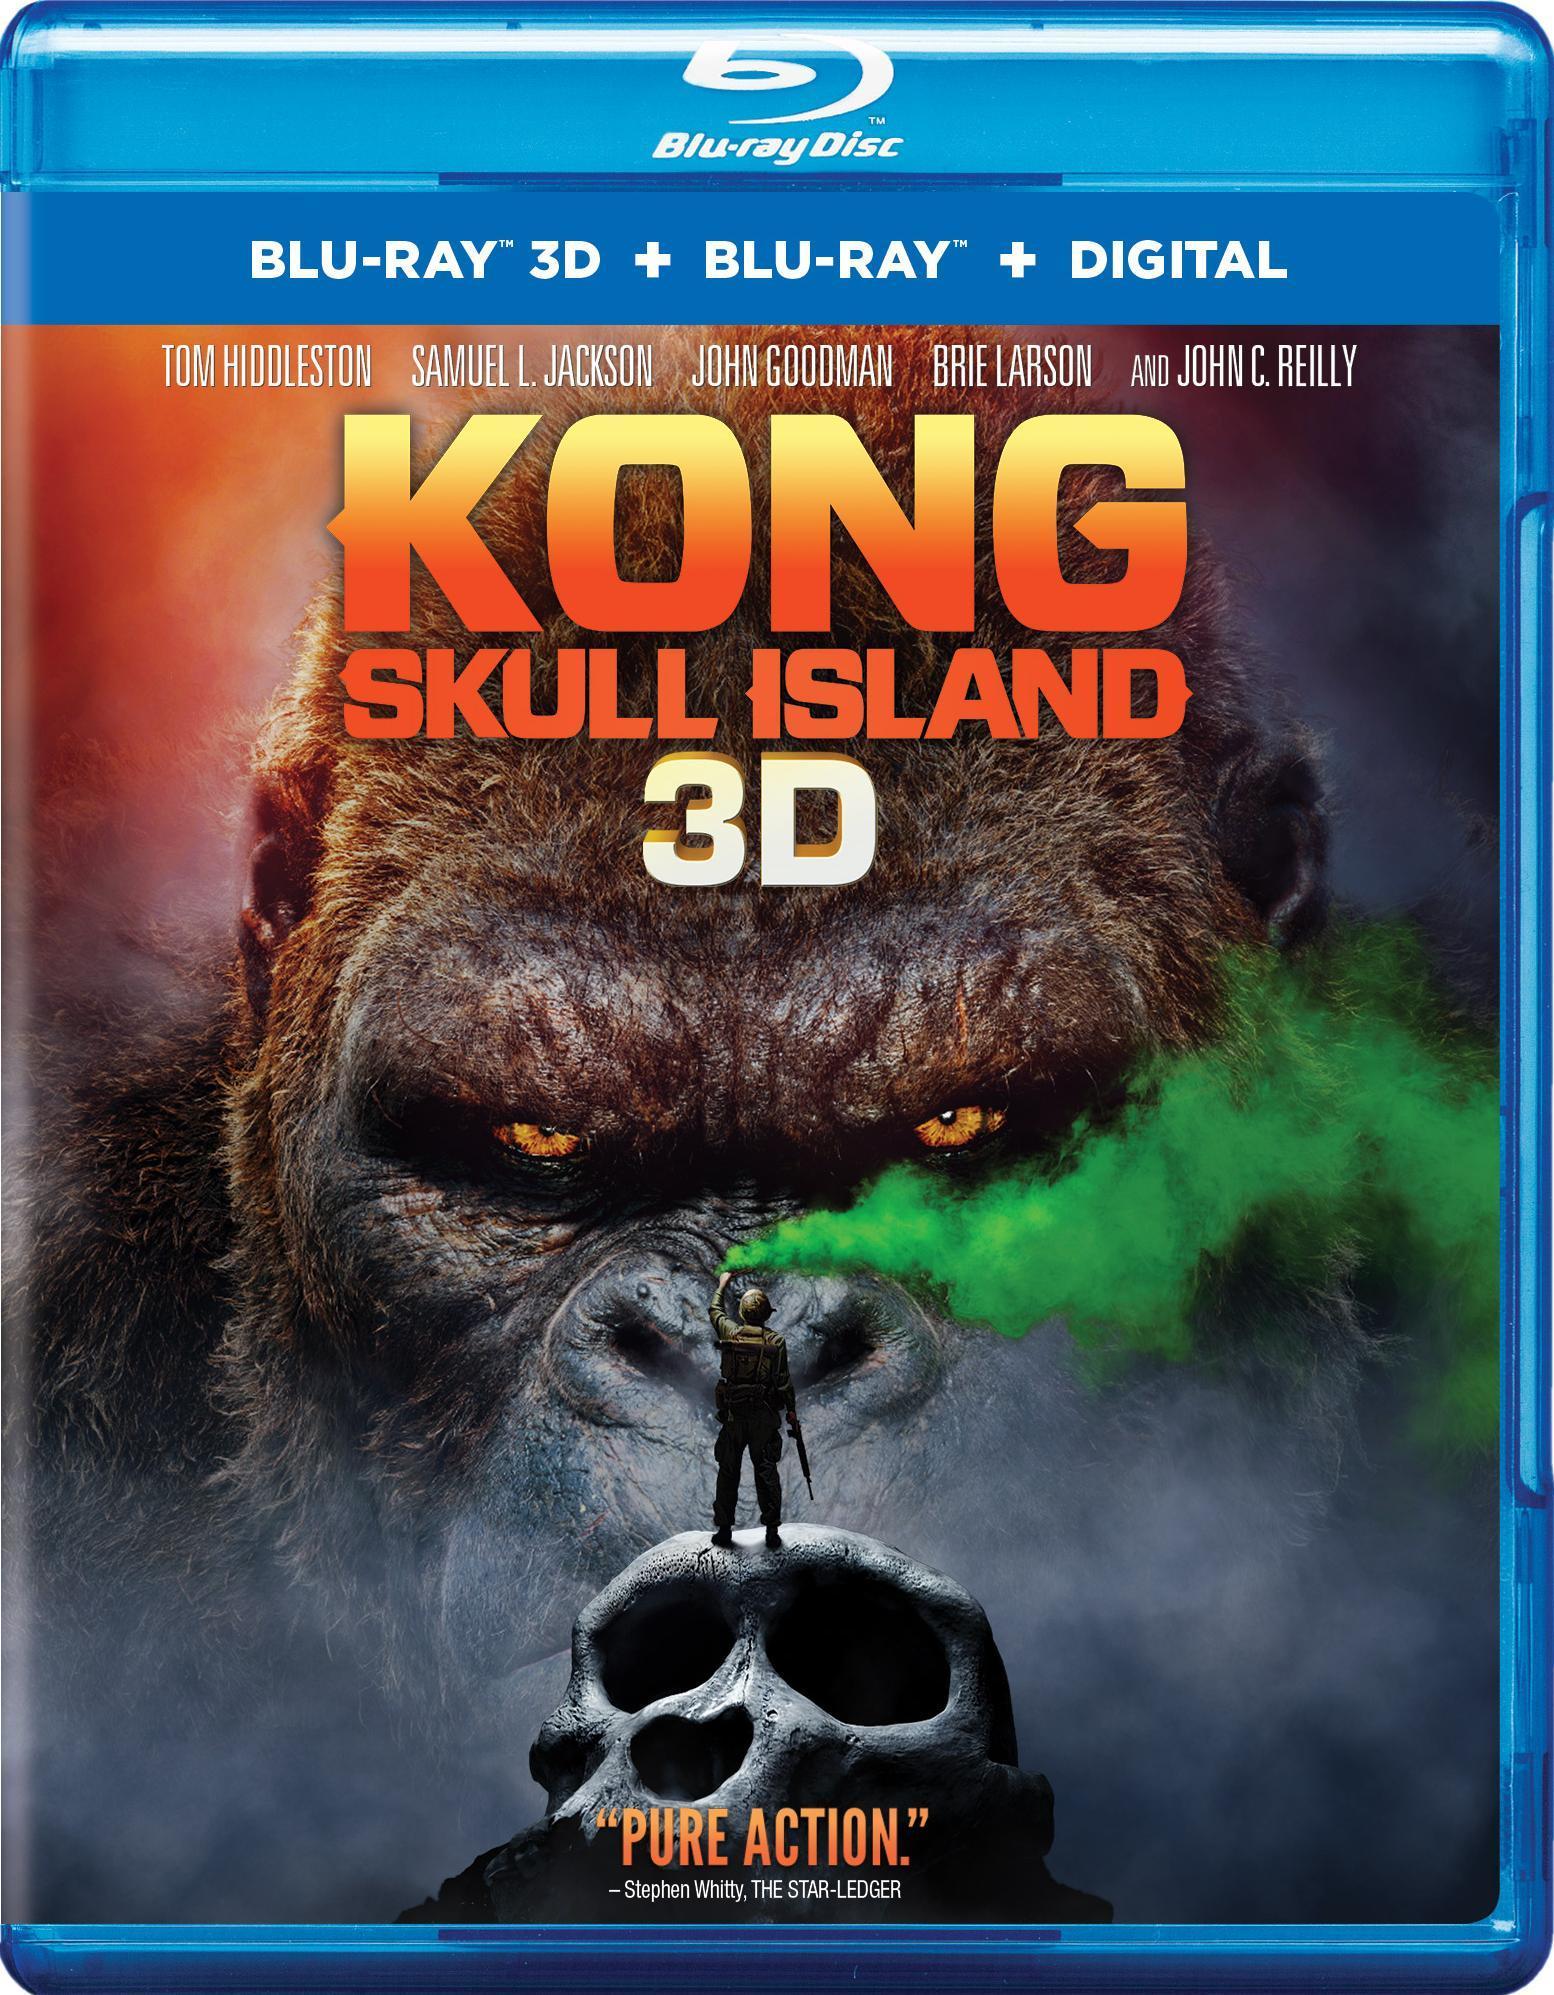 Kong: Skull Island (2017) poster image